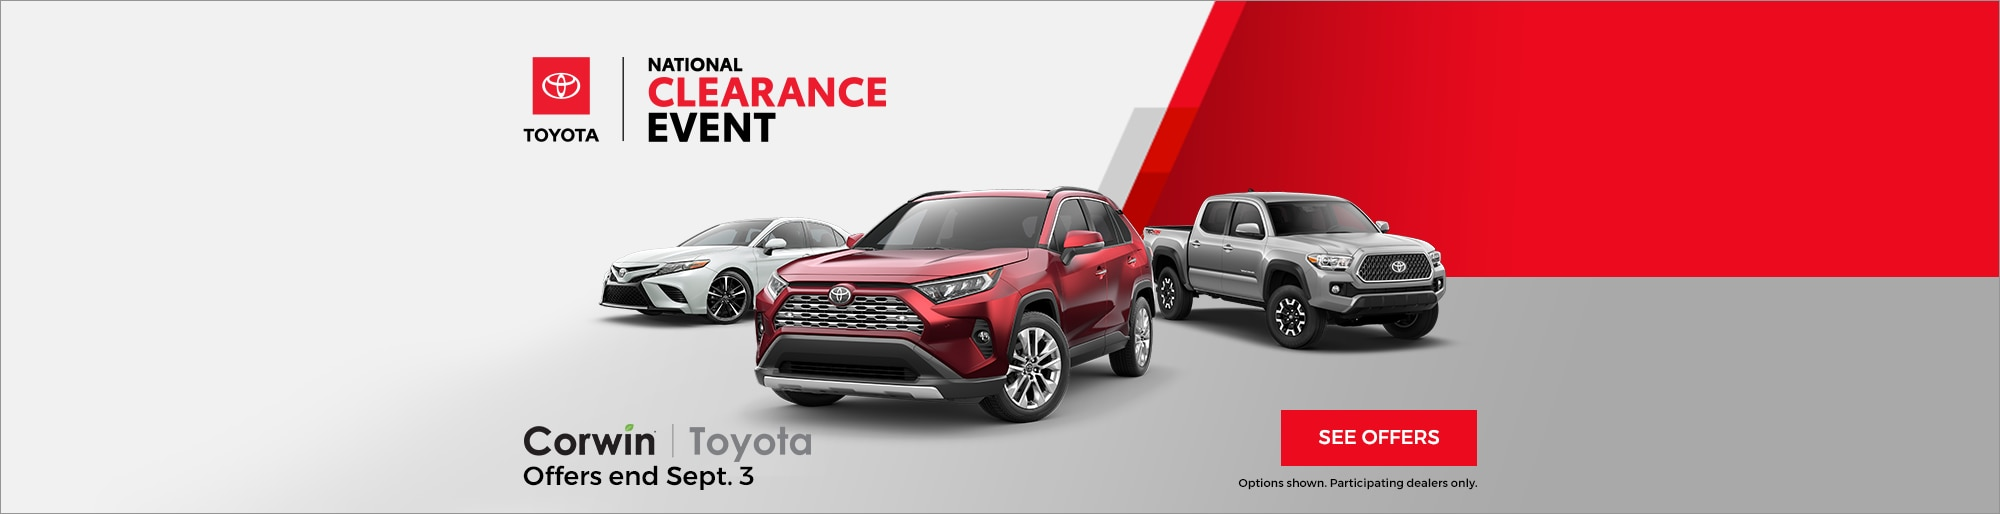 Fargo S Corwin Toyota New And Used Toyota Cars Near Moorhead Mn